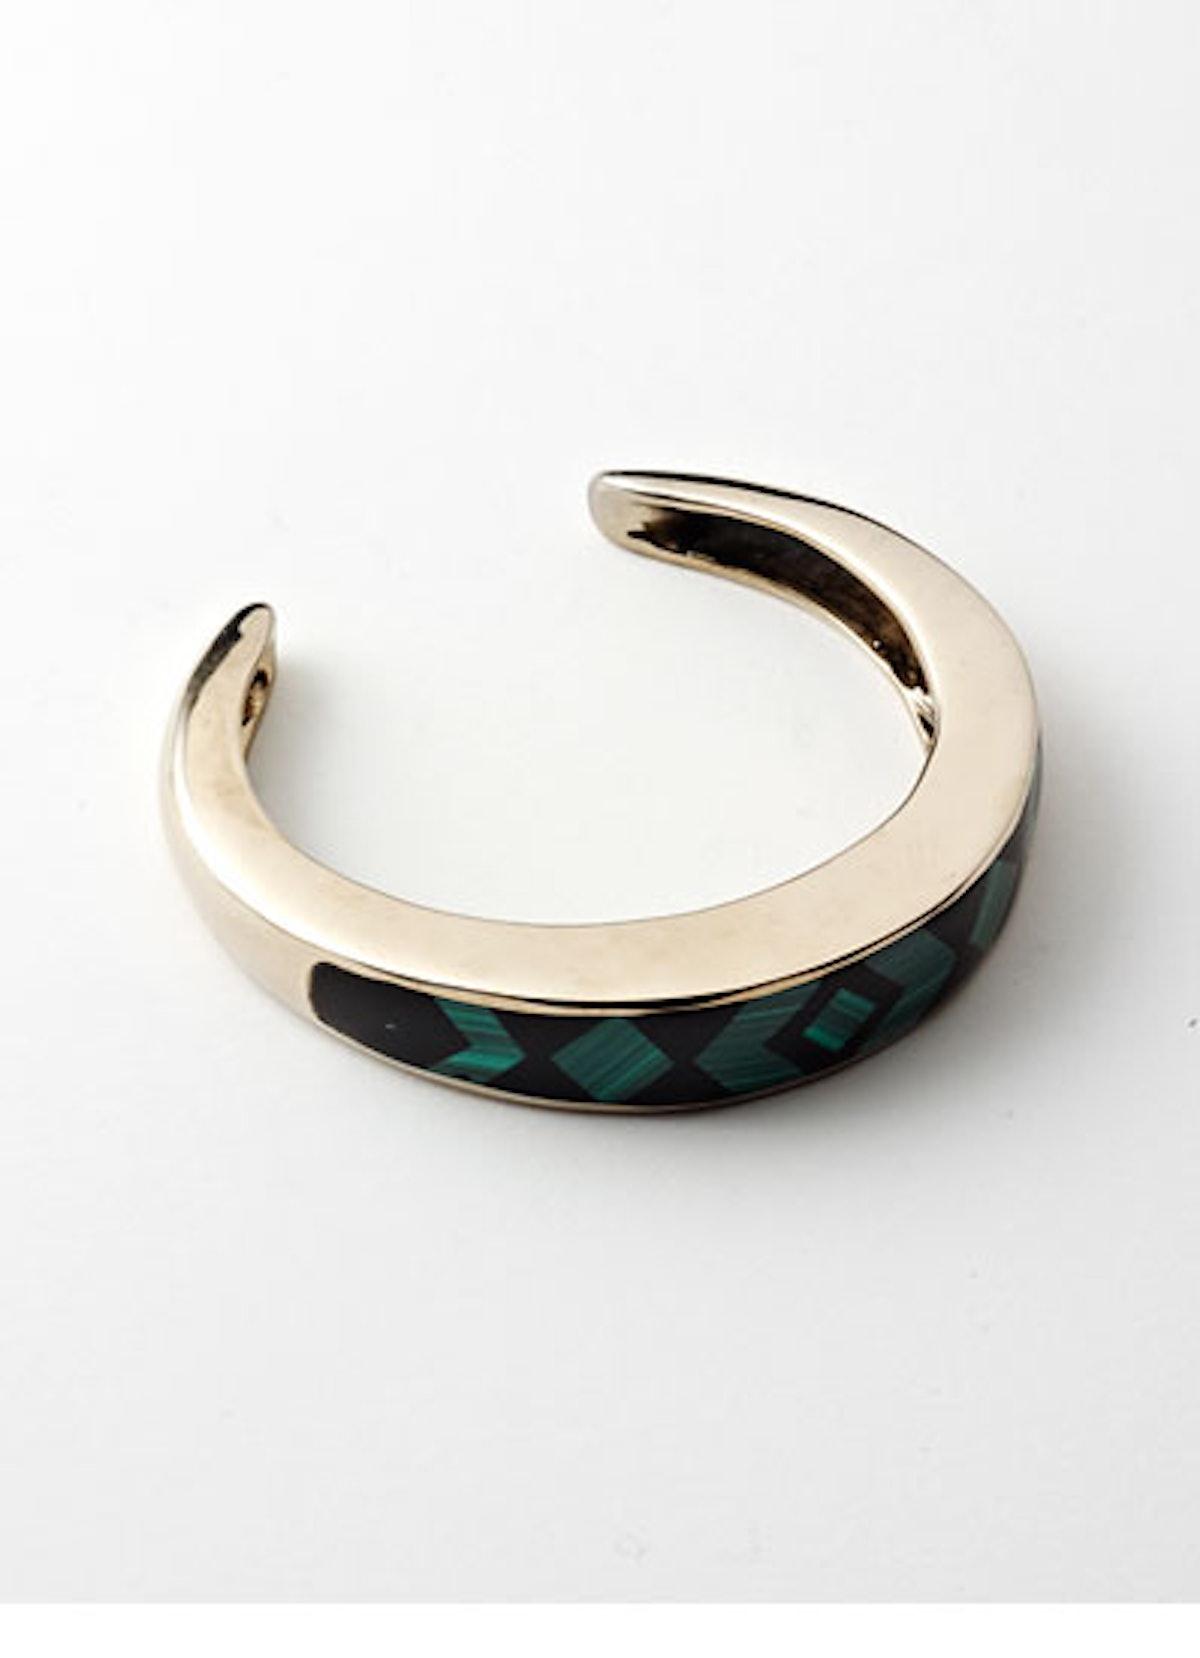 acss-malachite-jewelry-05-v.jpg